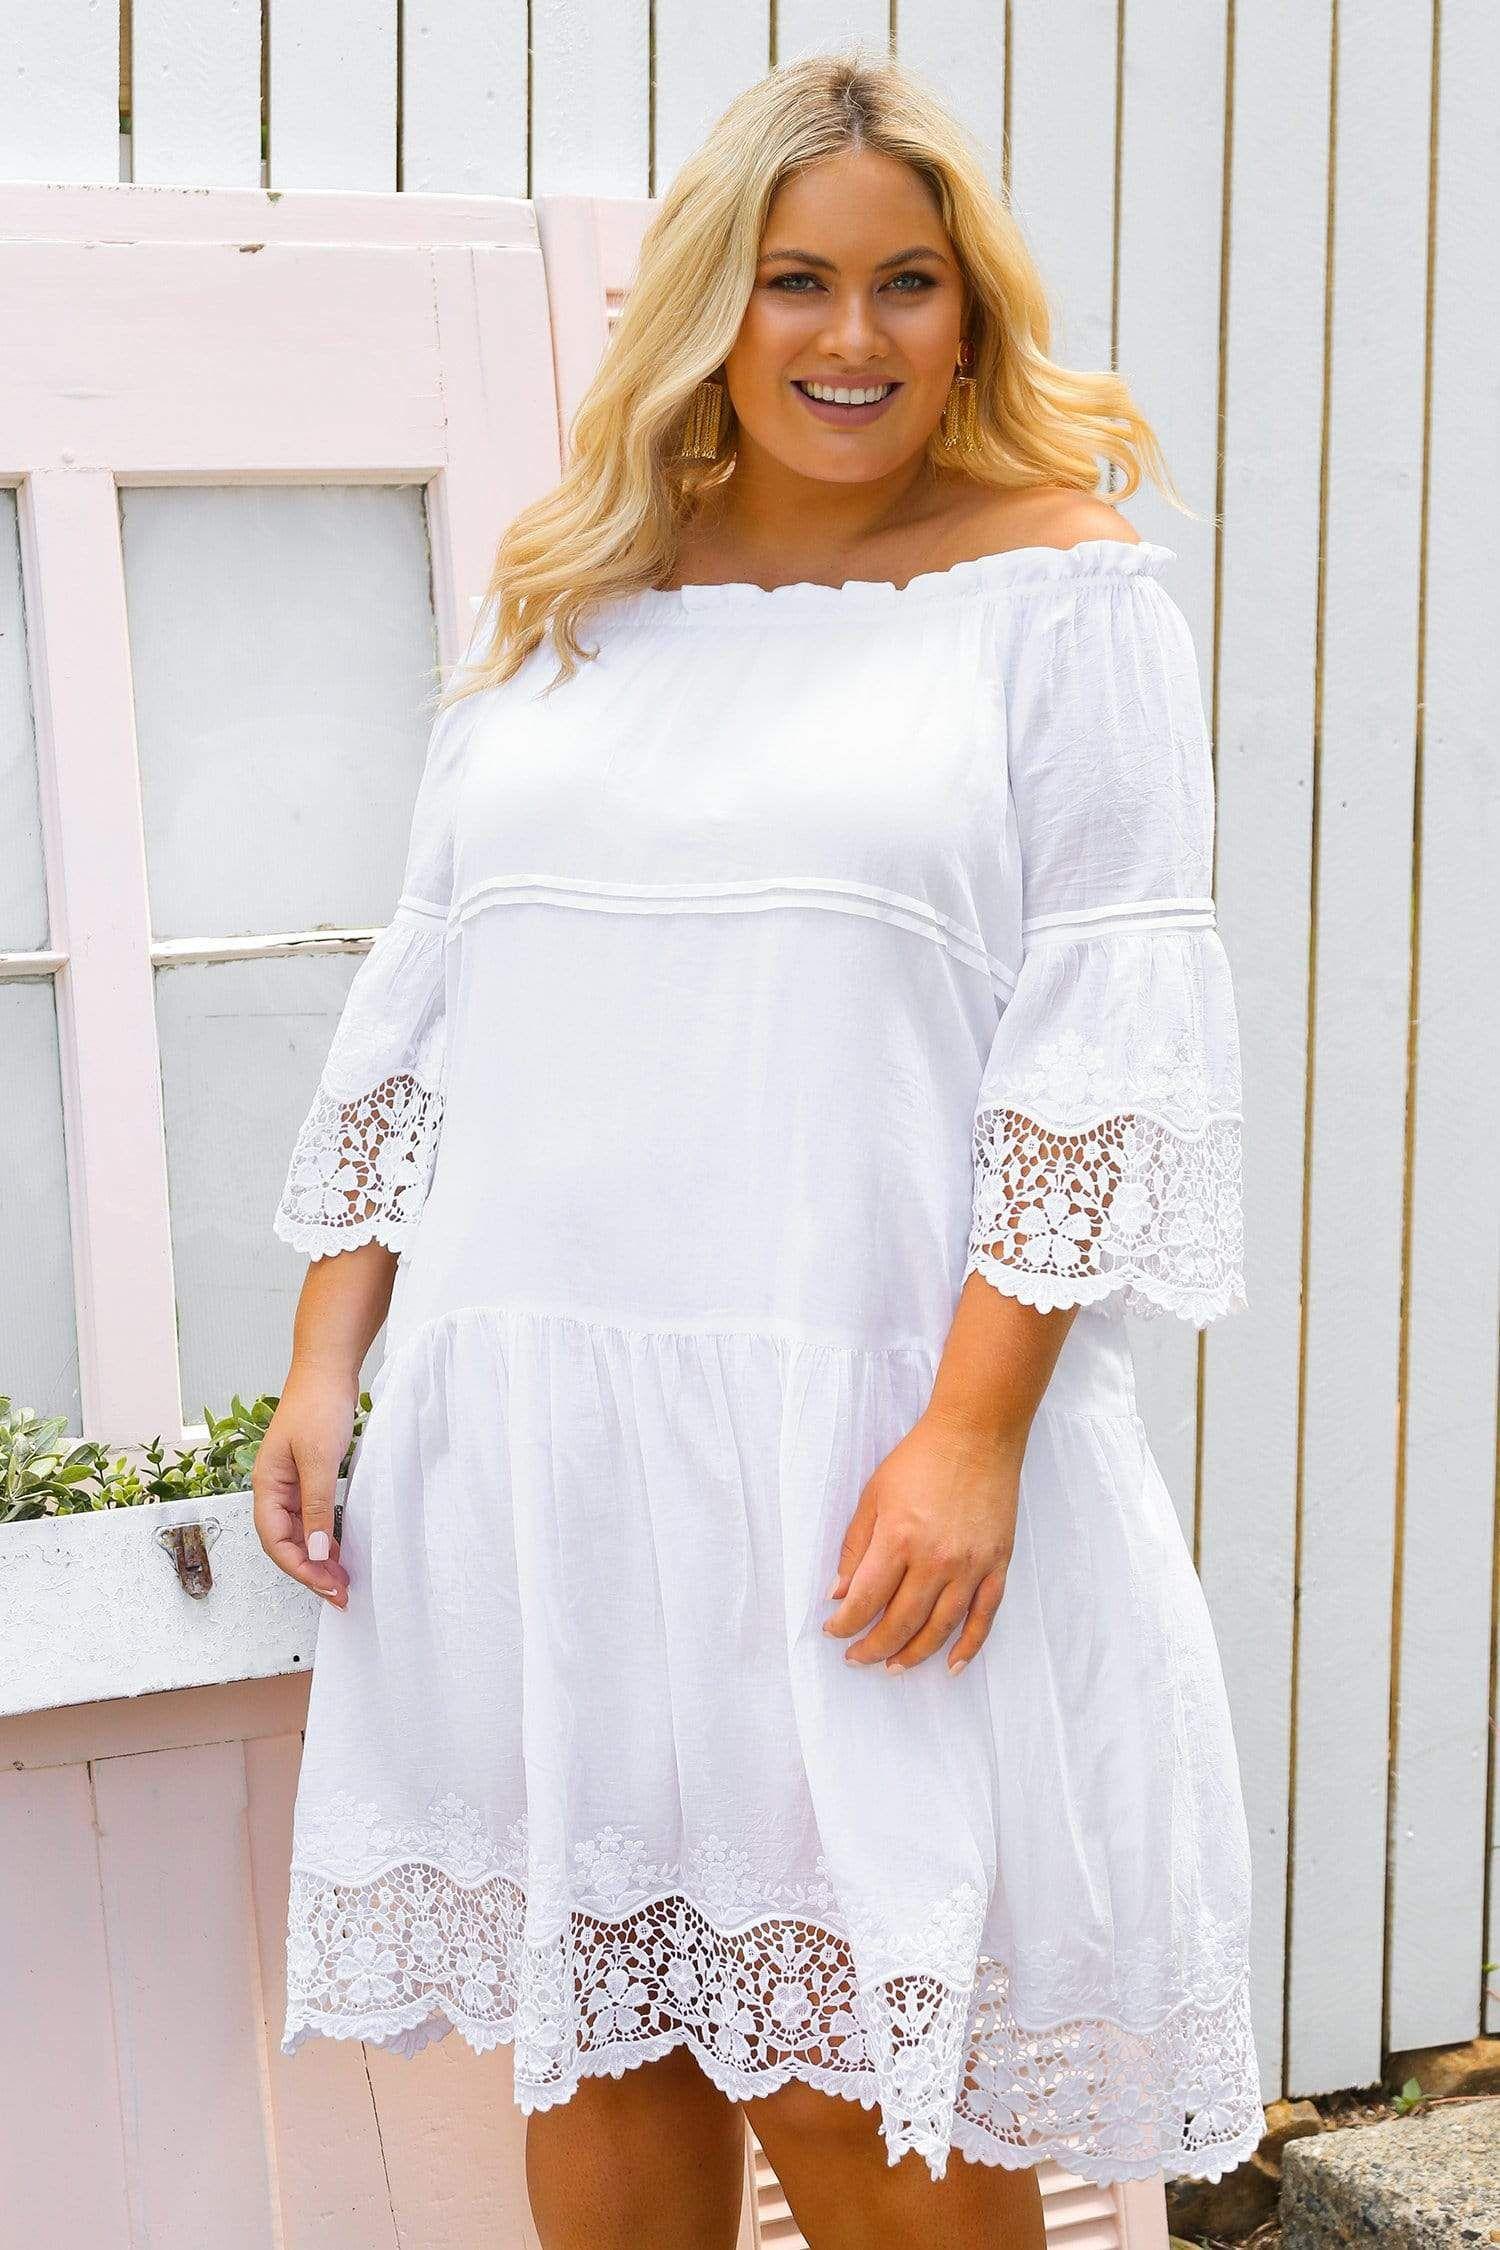 Adrift Women S Plus Size Willa Dress In Lace White 100 Cotton Relaxed Fit Shape Adrift Clothing Dresses Stylish White Dress White Lace [ 2250 x 1500 Pixel ]